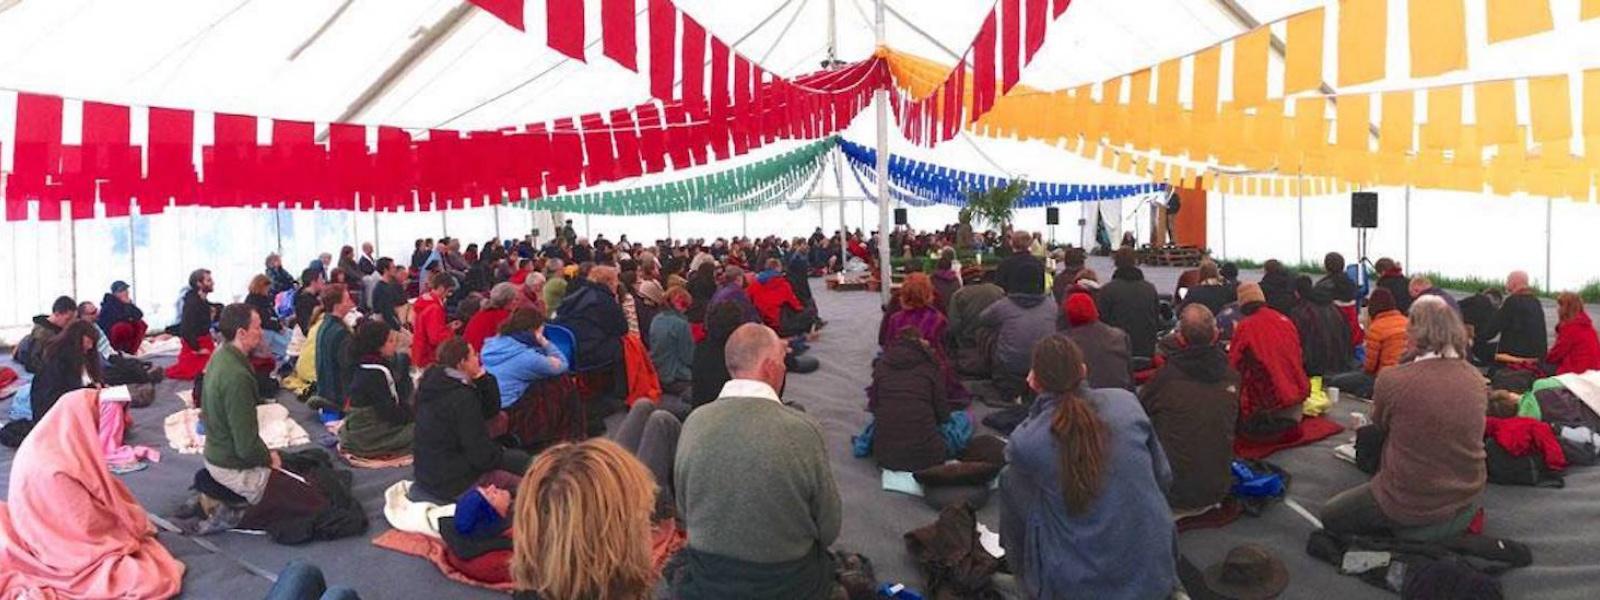 The Triratna Buddhist Community